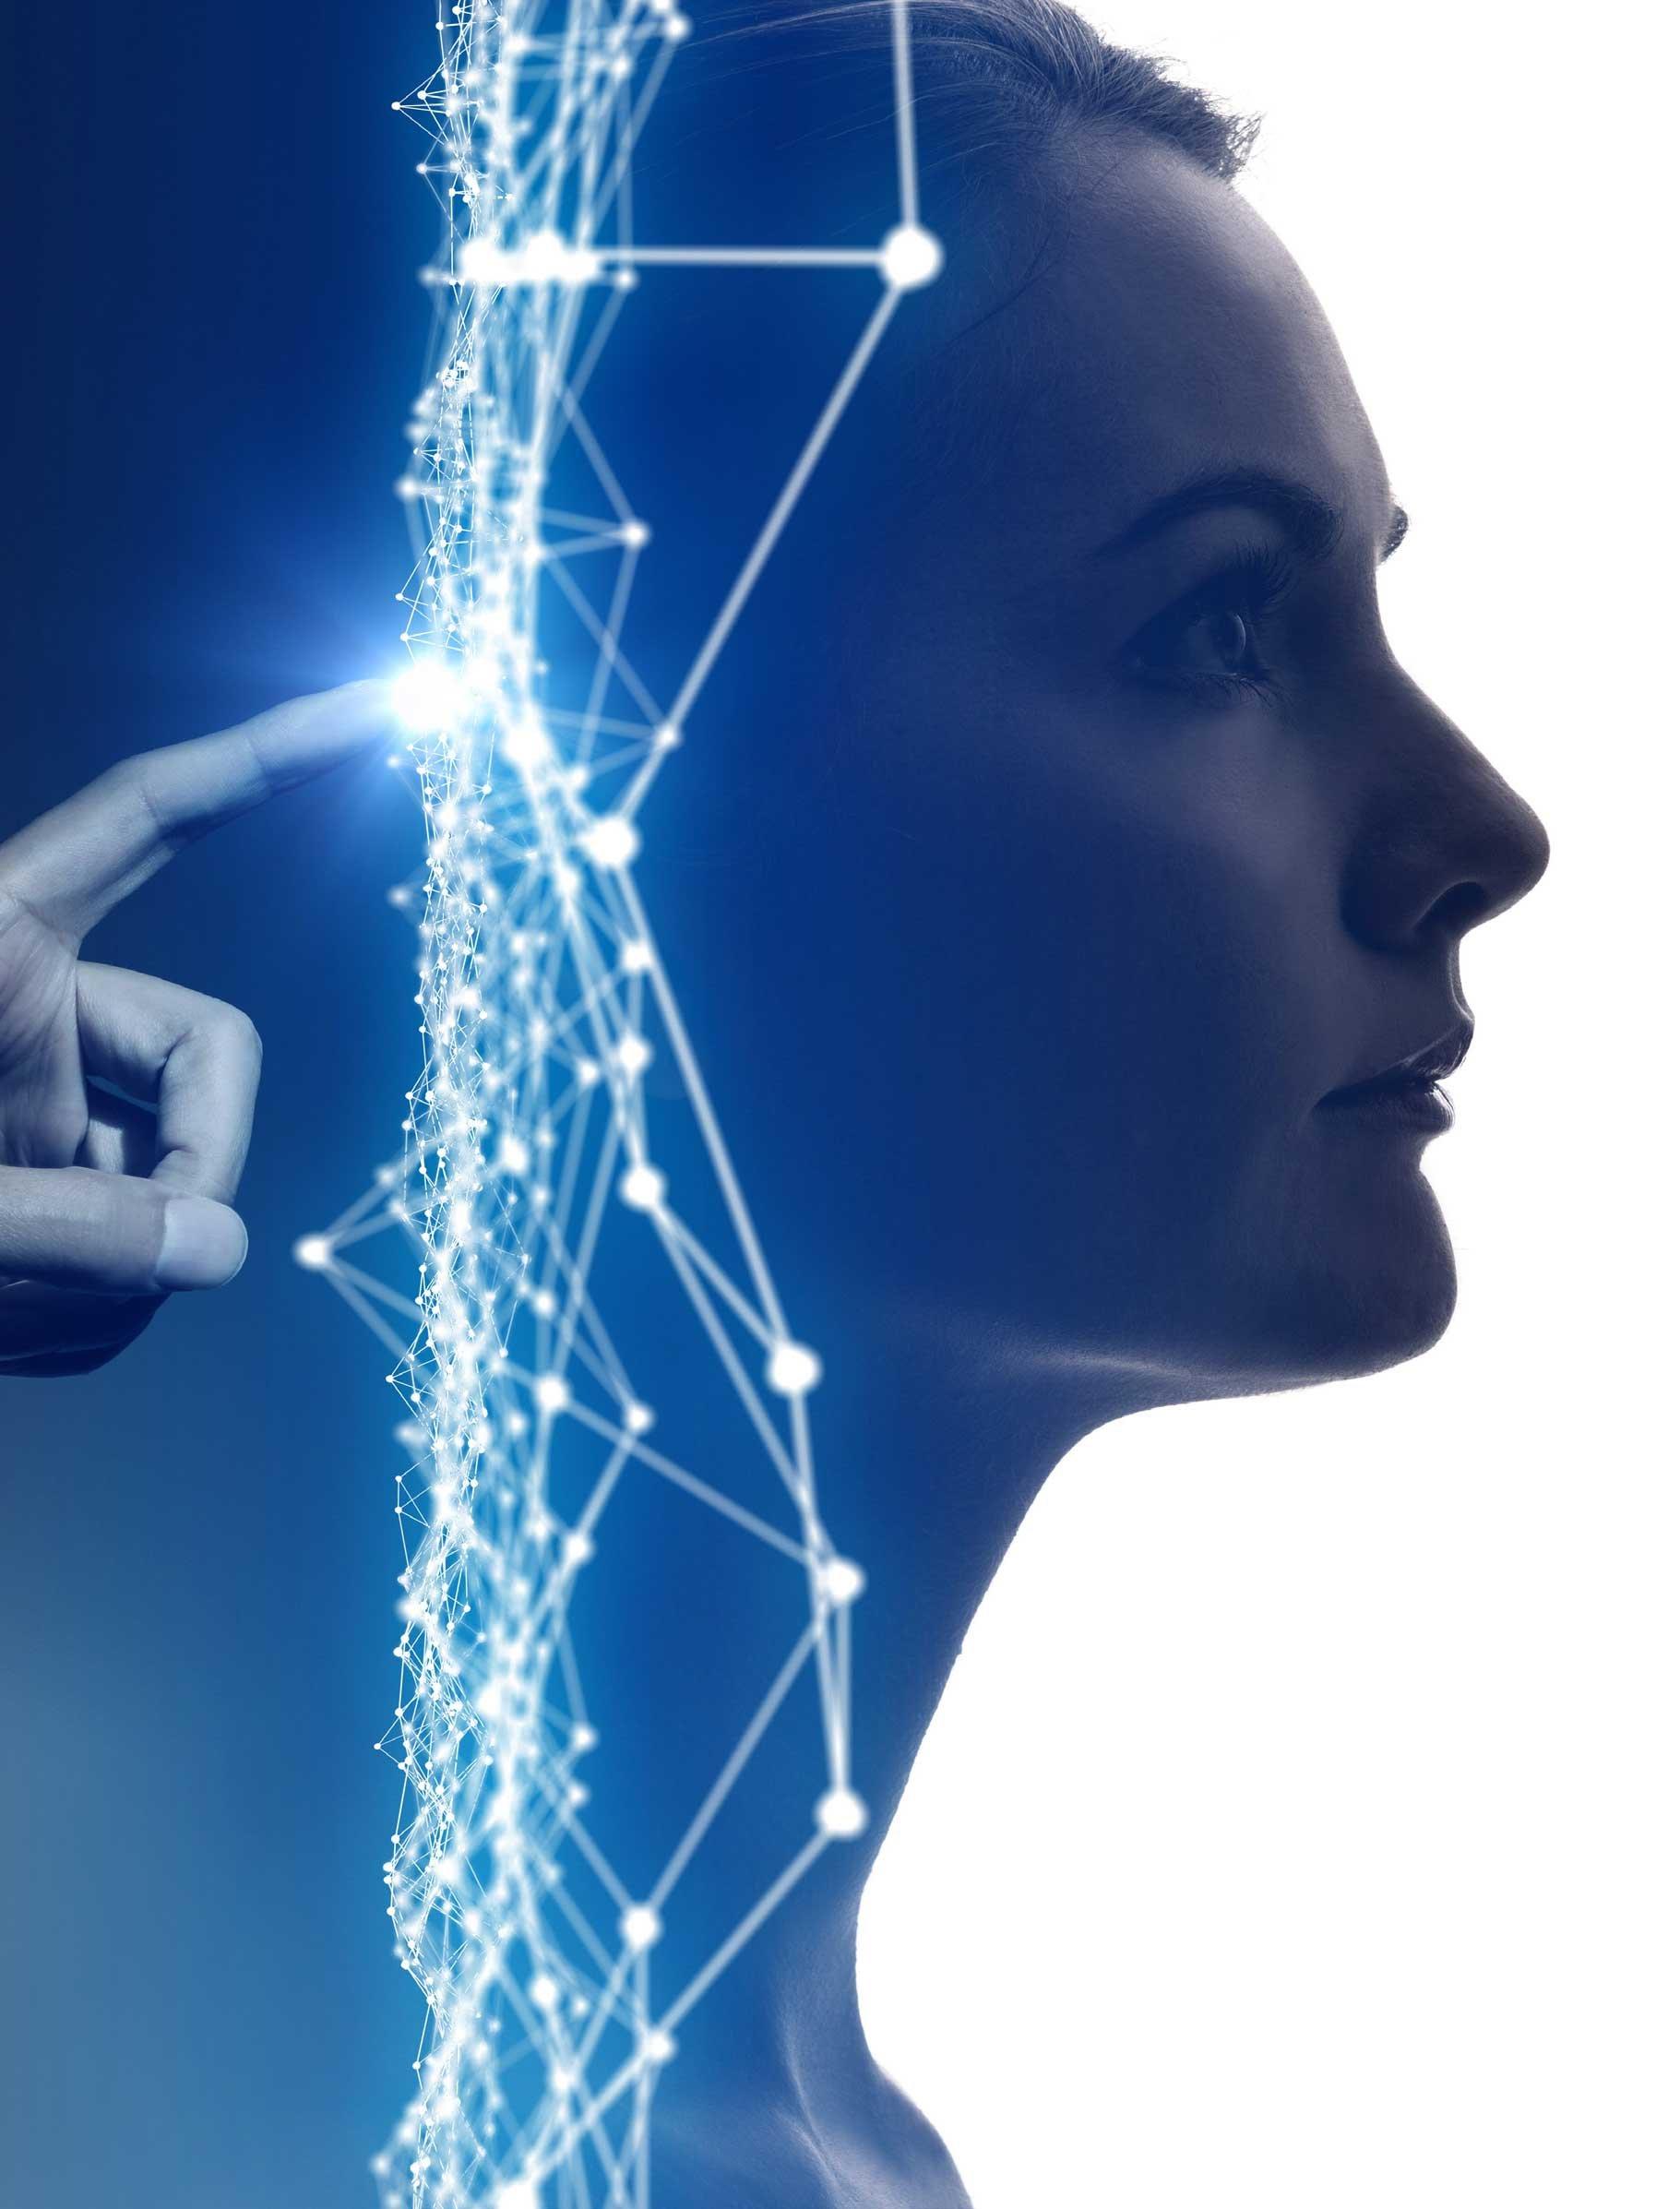 Cognitive Technologies